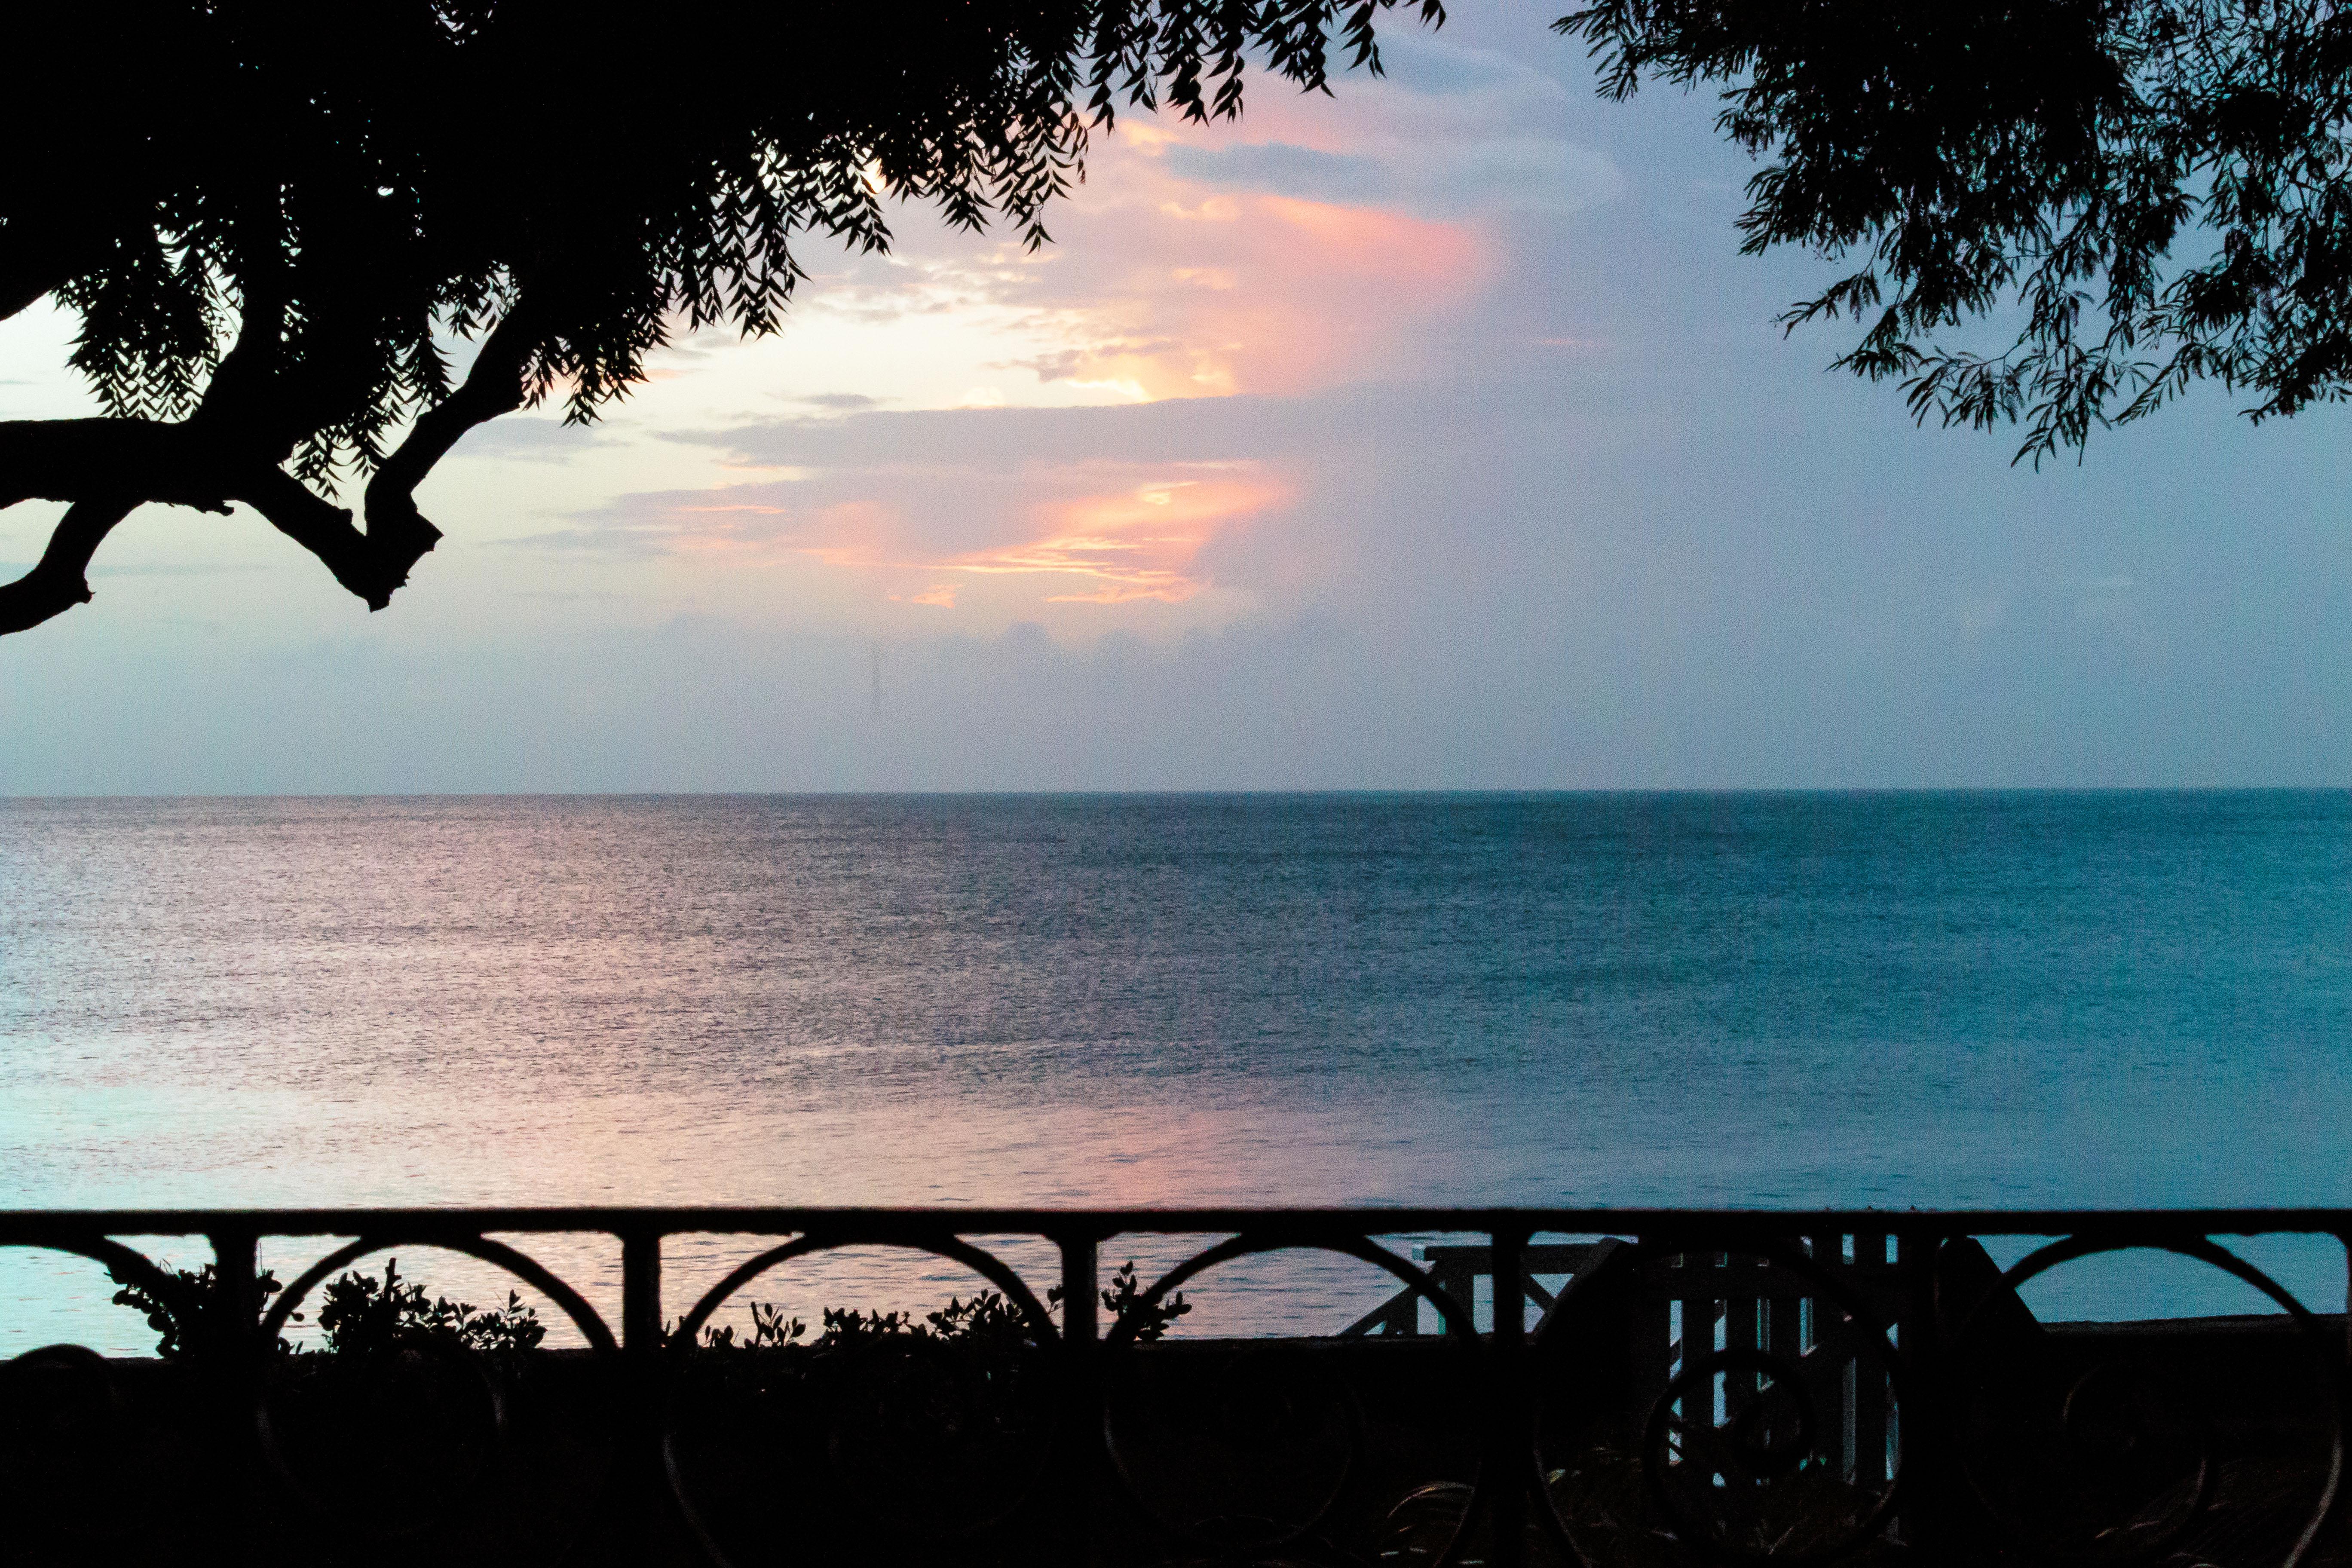 BB352 Sunset View